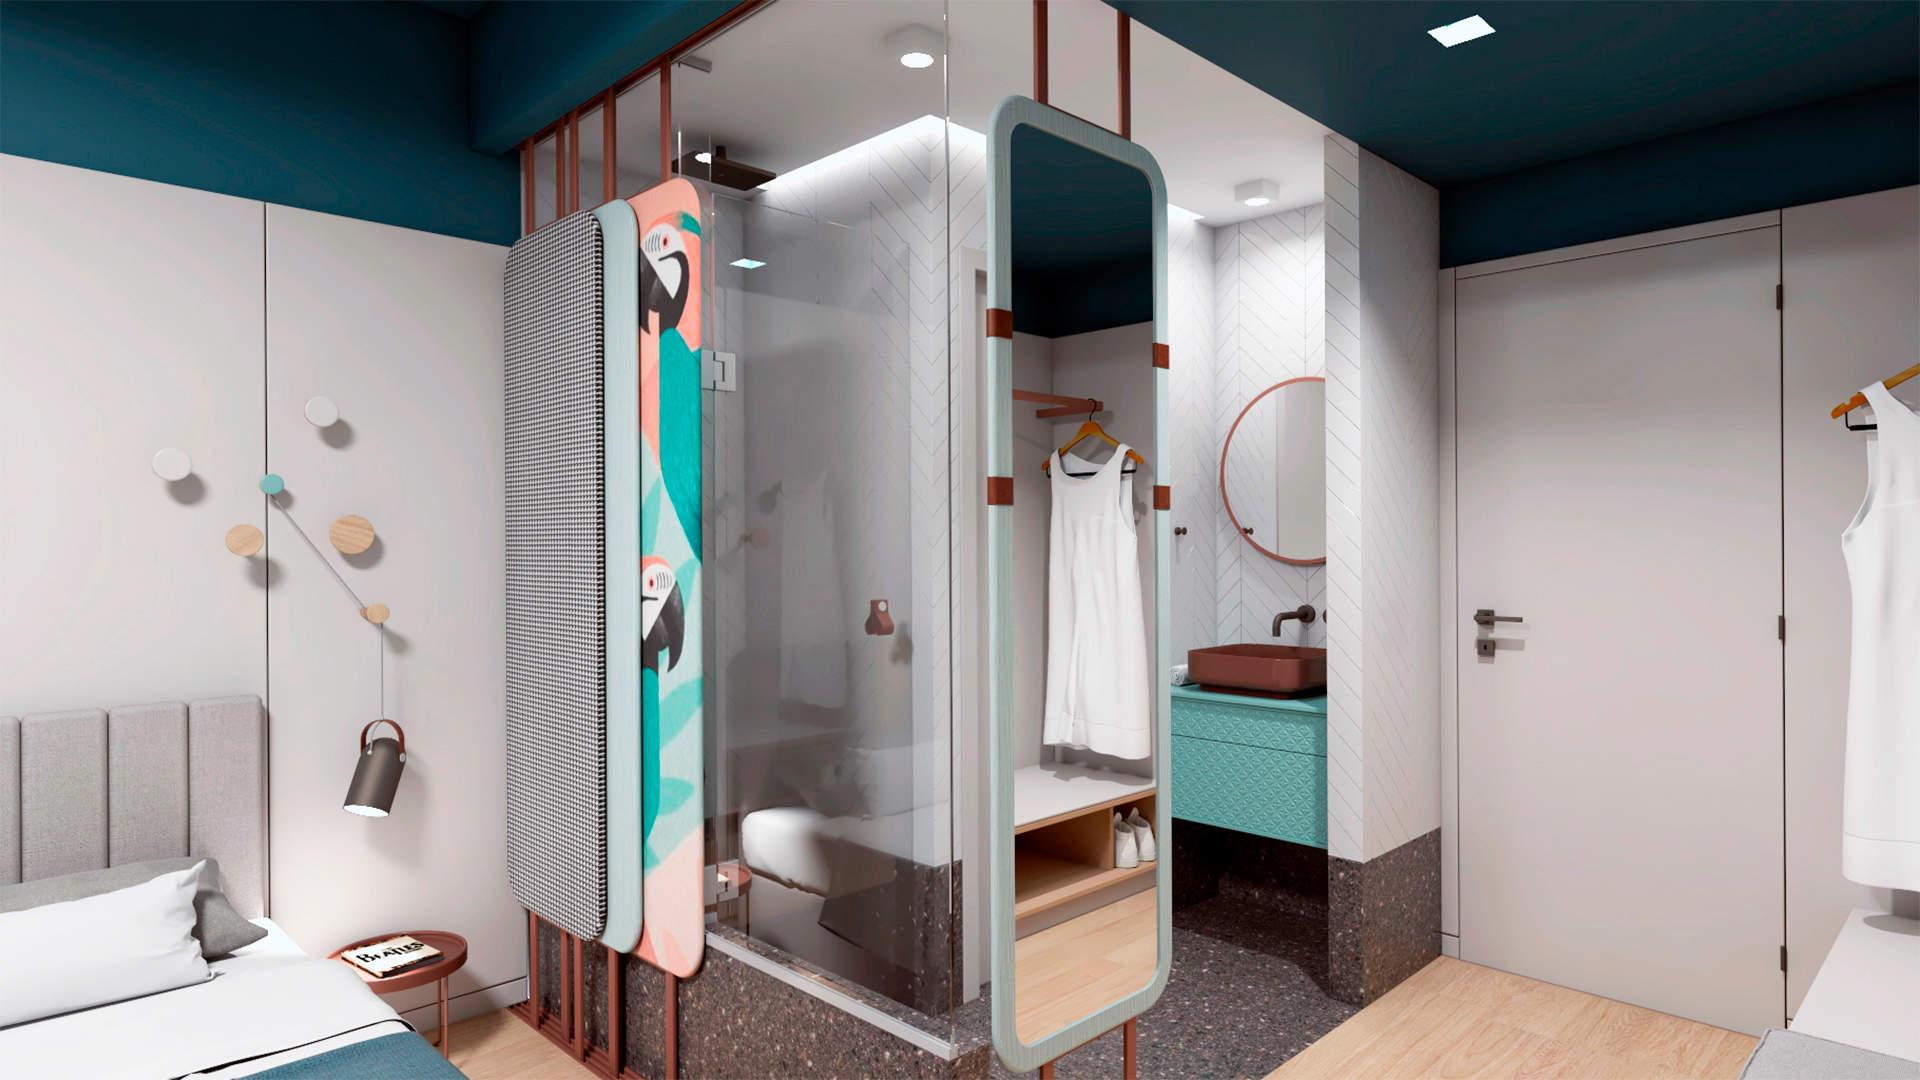 City hotel room, interior design, bathroom. Δωμάτιο αστικού ξενοδοχείου, μπάνιο.